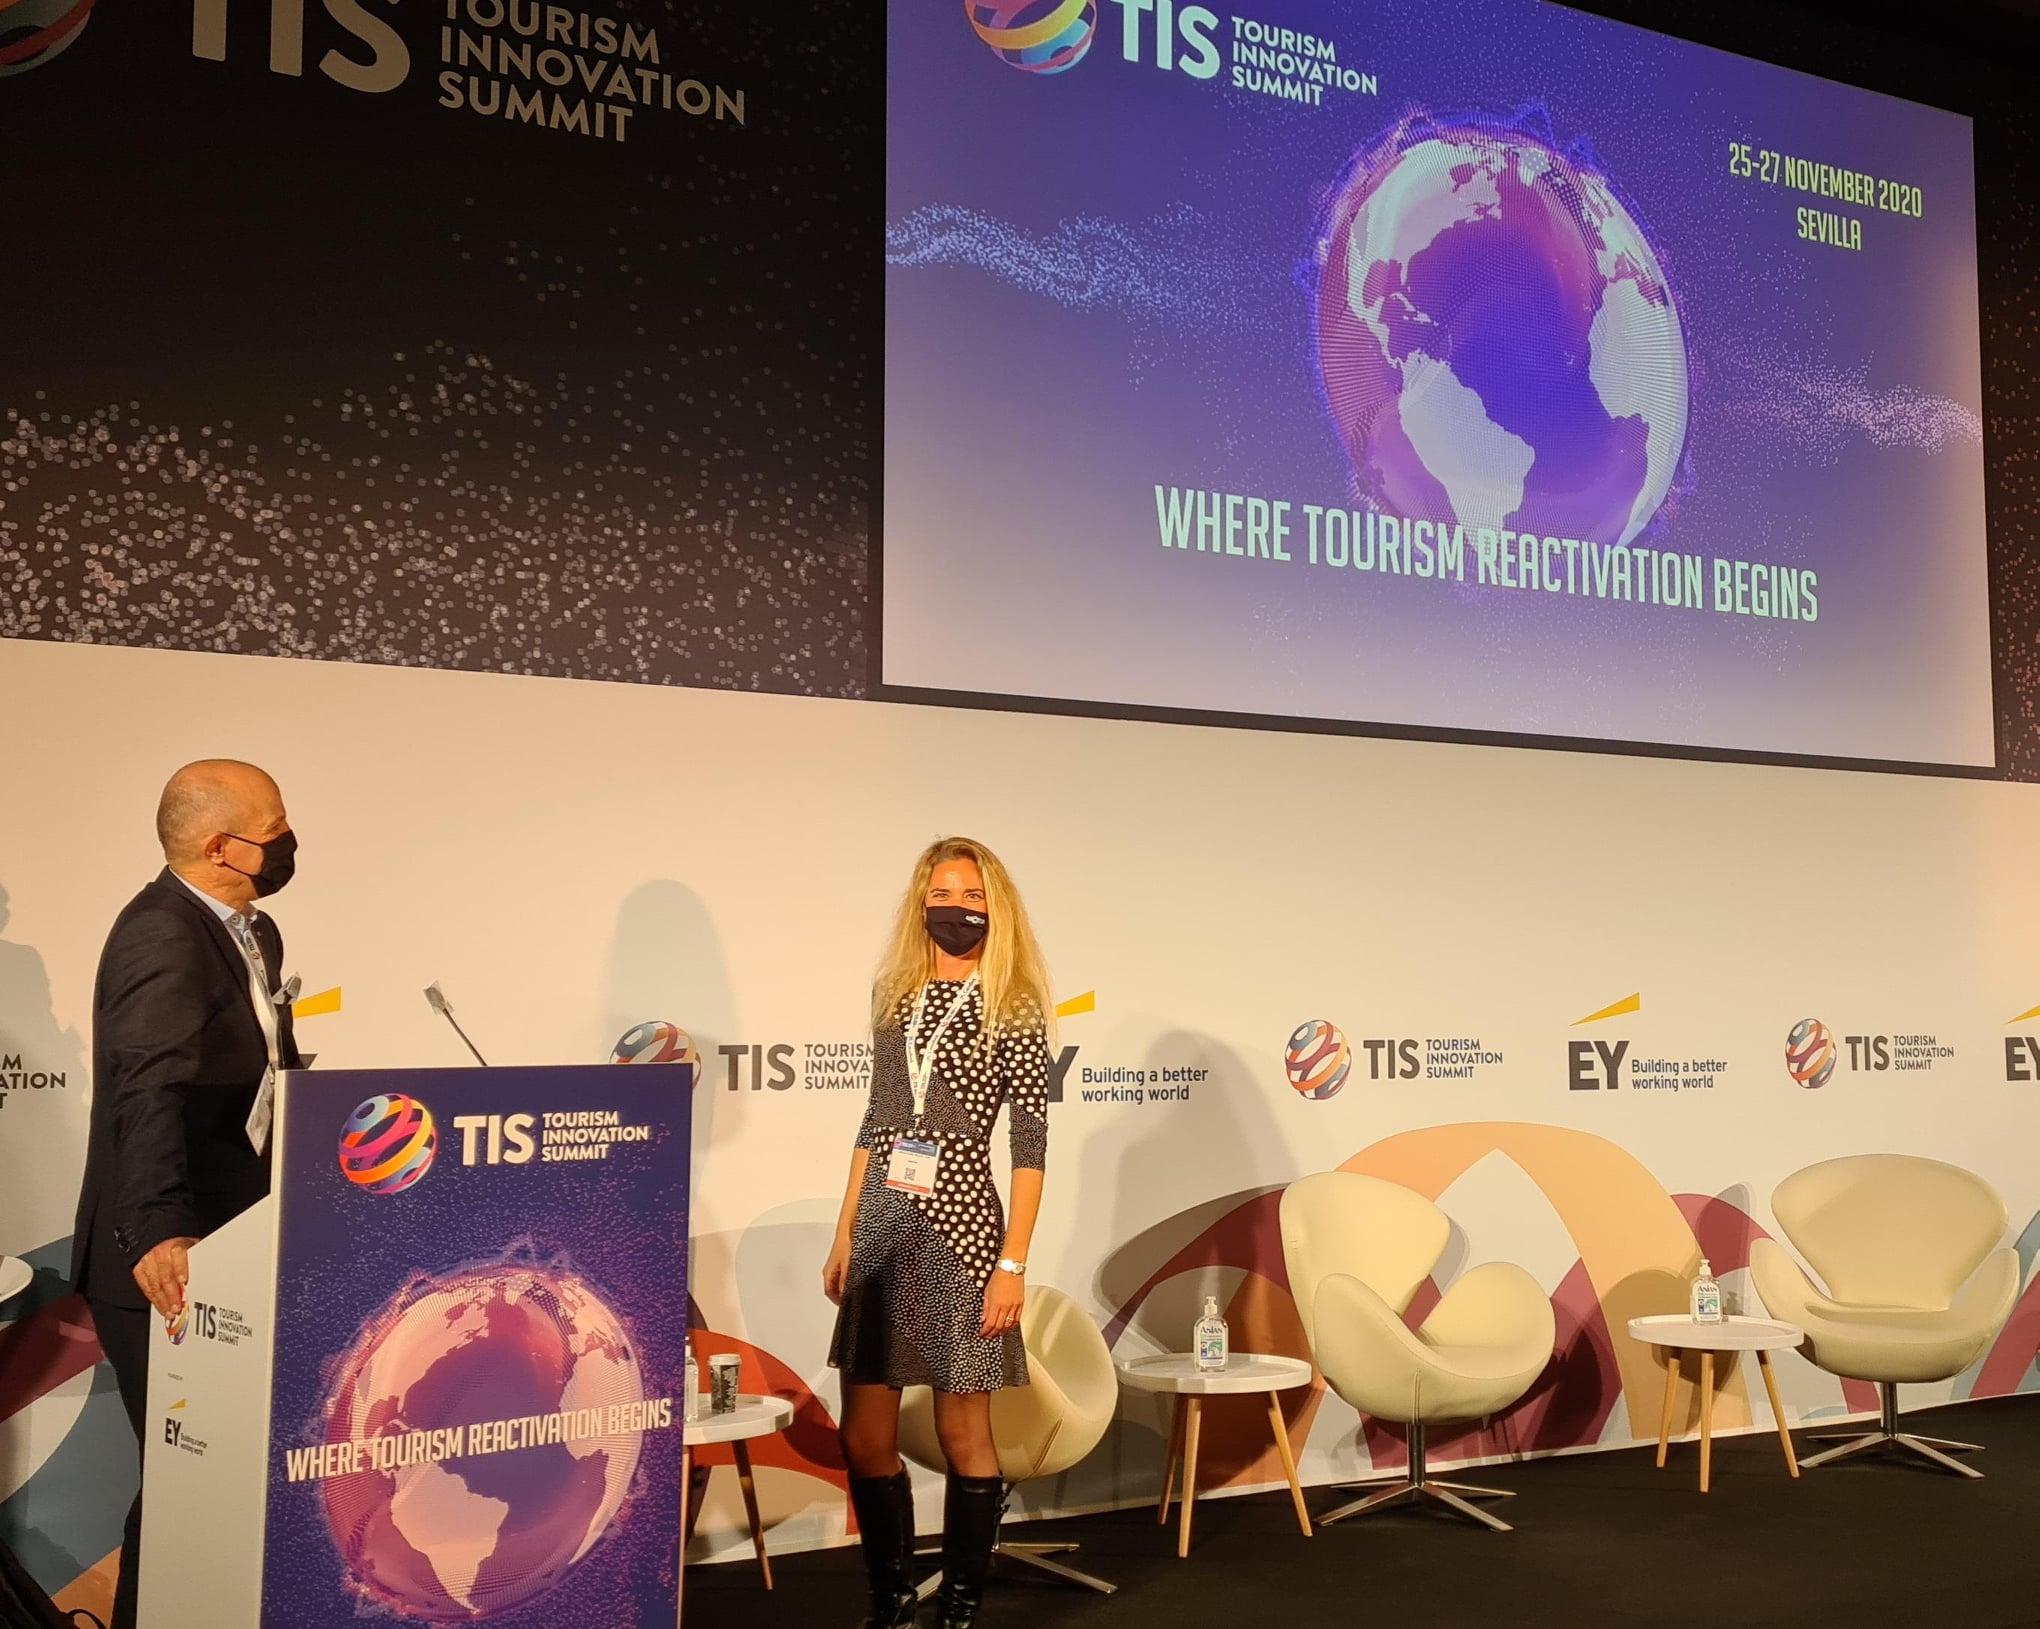 Speakers at TIS